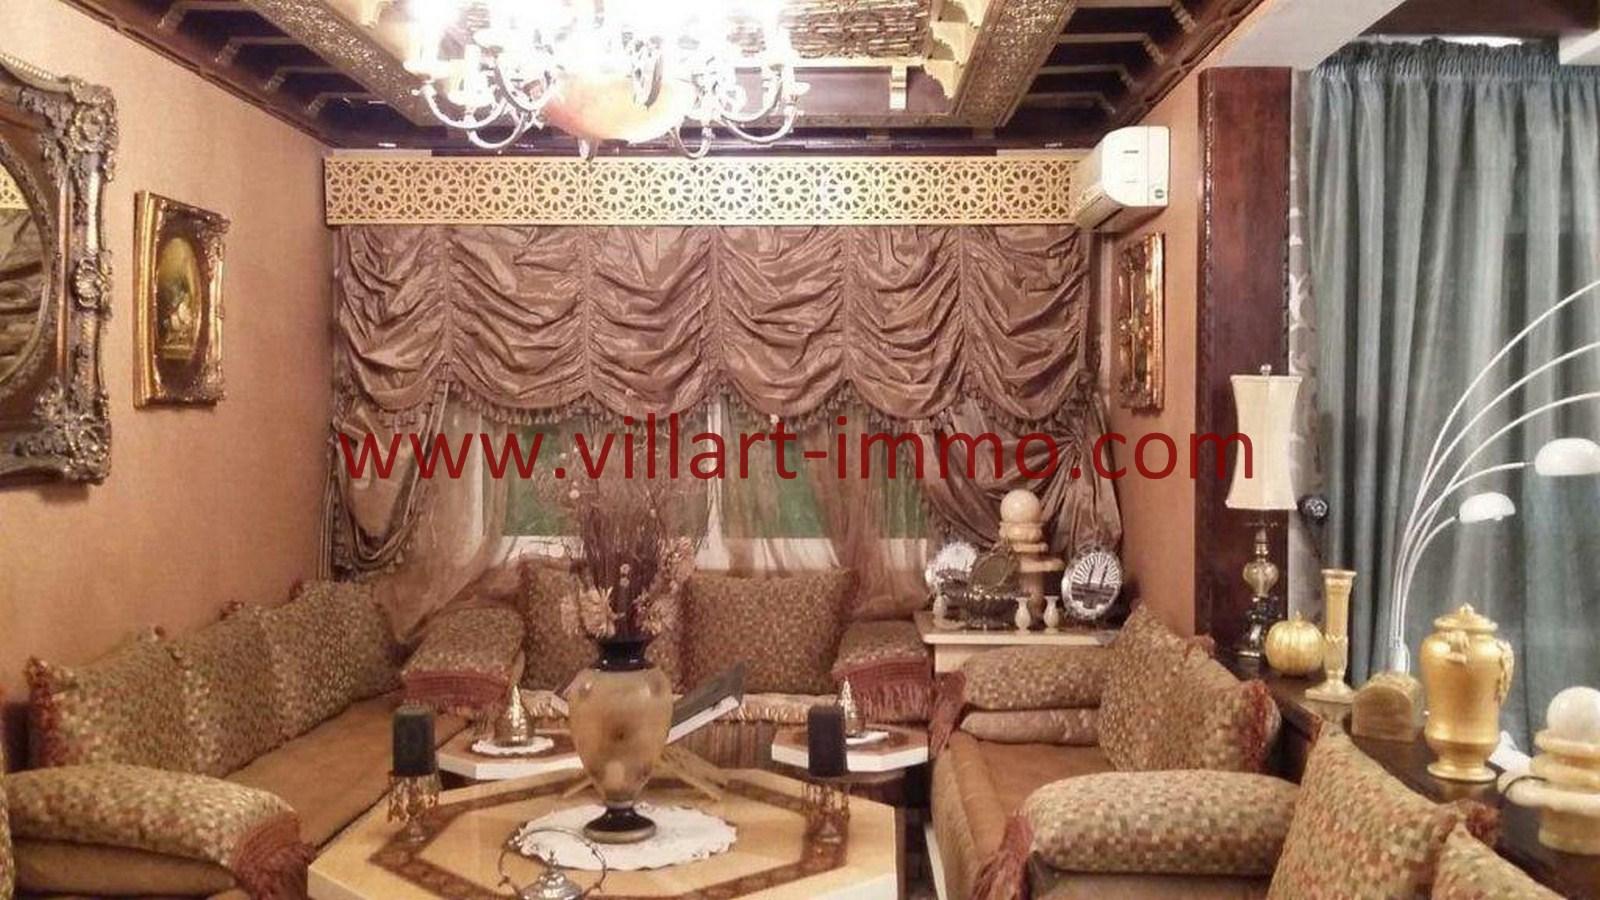 2-Vente-Appartement-Tanger-Salon-VA560-Villart Immo